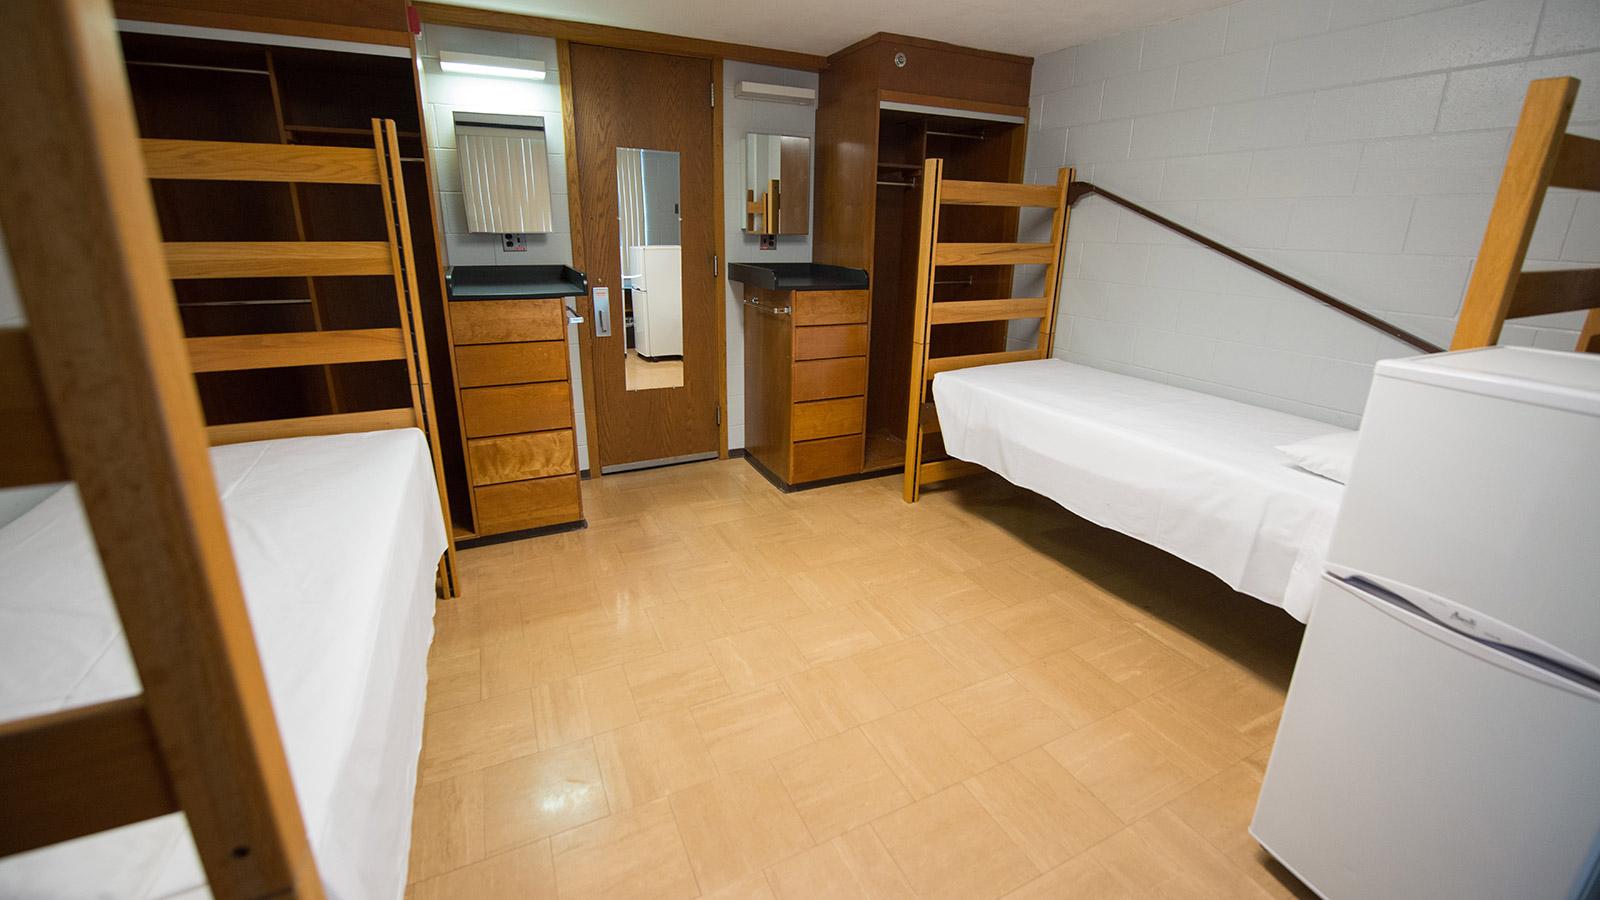 Harper Hall double room setup.